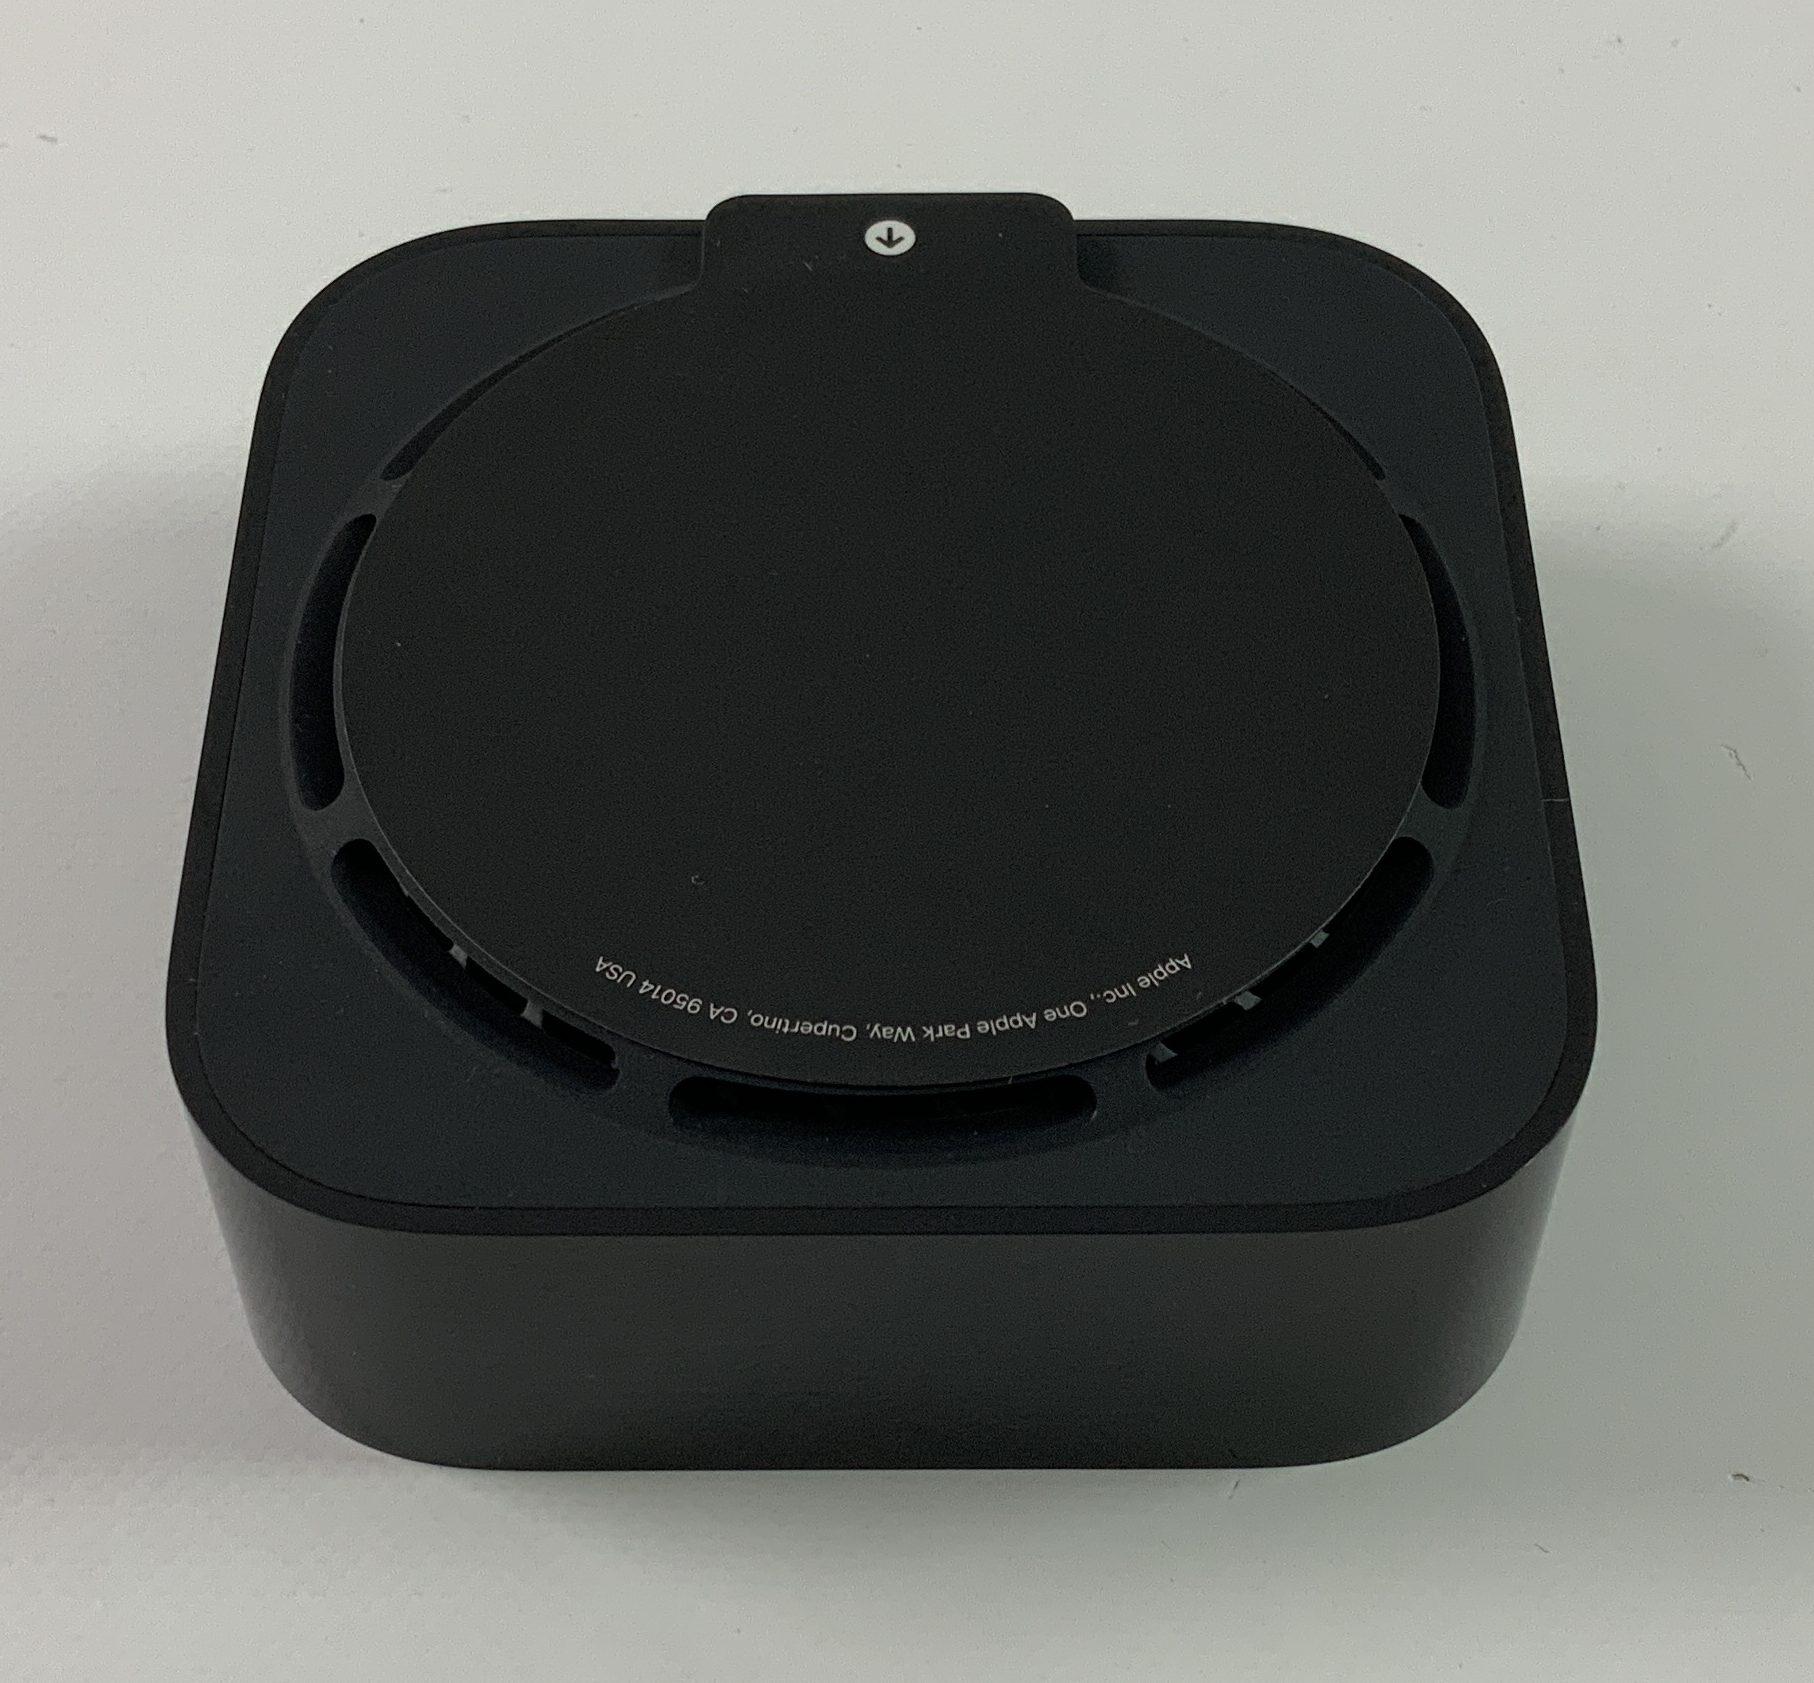 Apple TV 4K (2nd Gen) (64 GB), 64 GB, bild 2